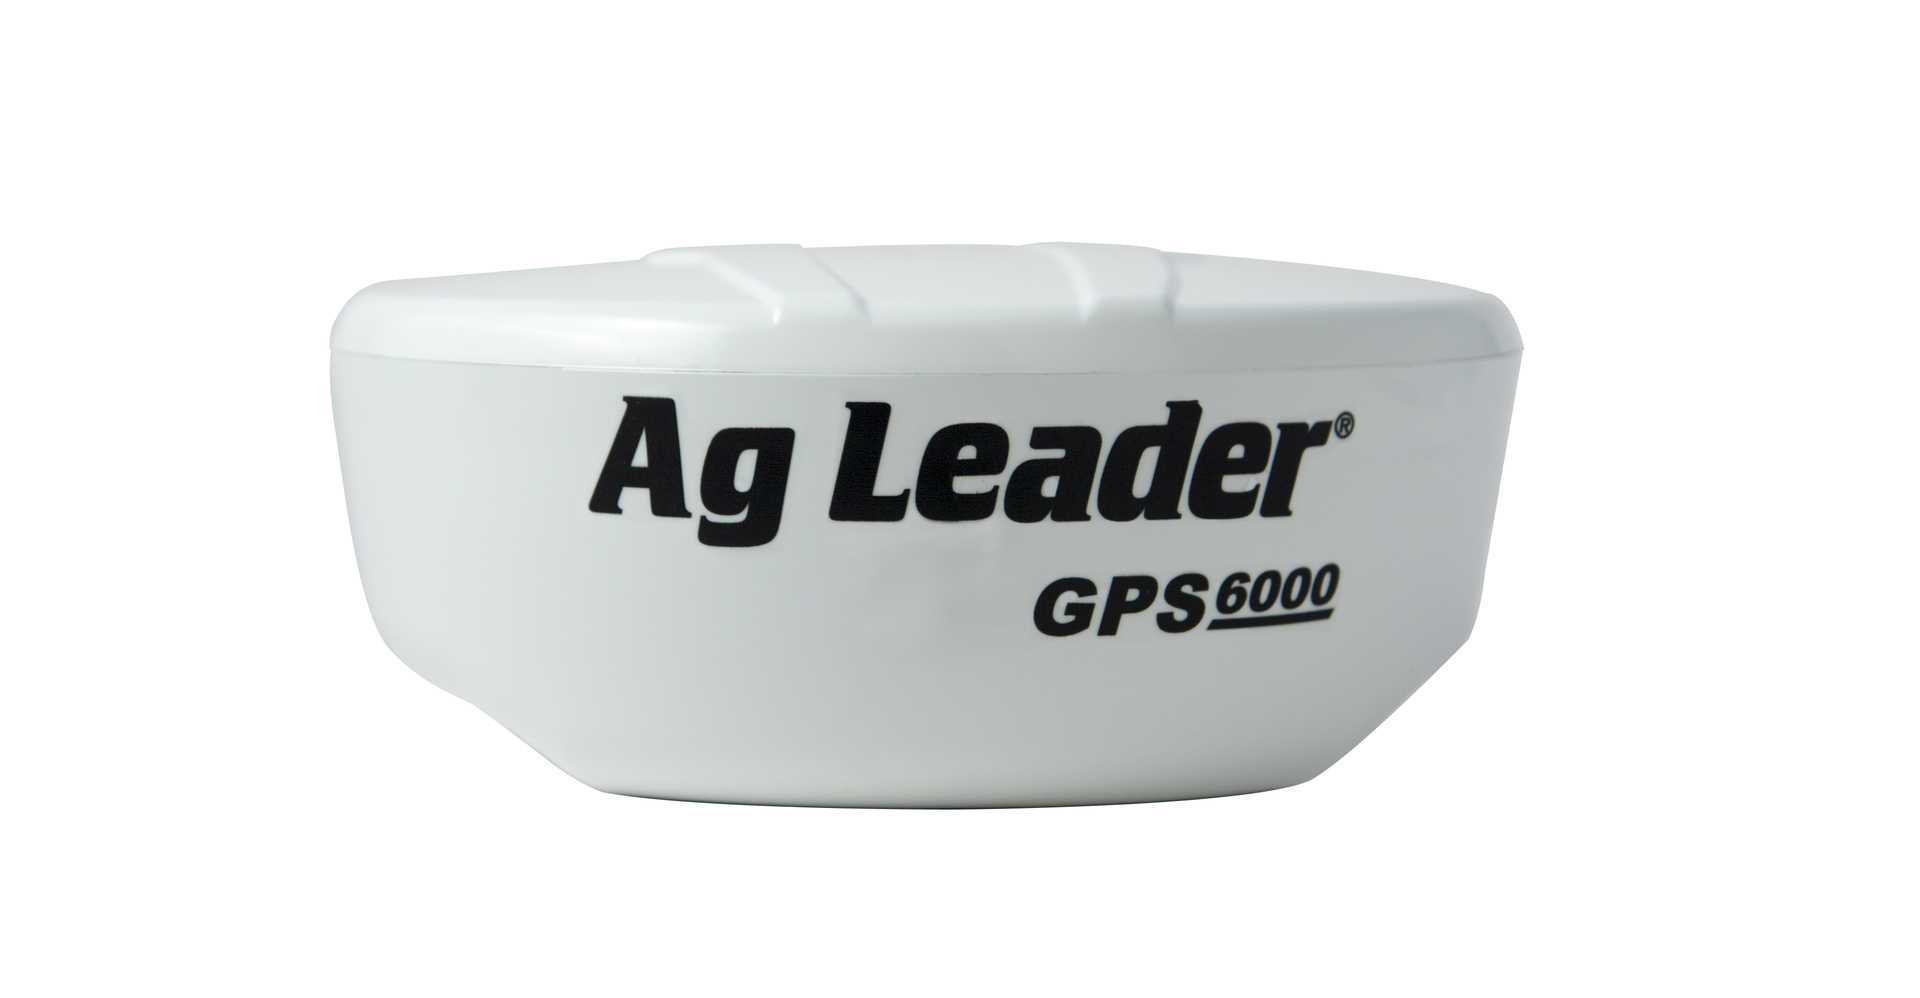 AgLeader GPS6000